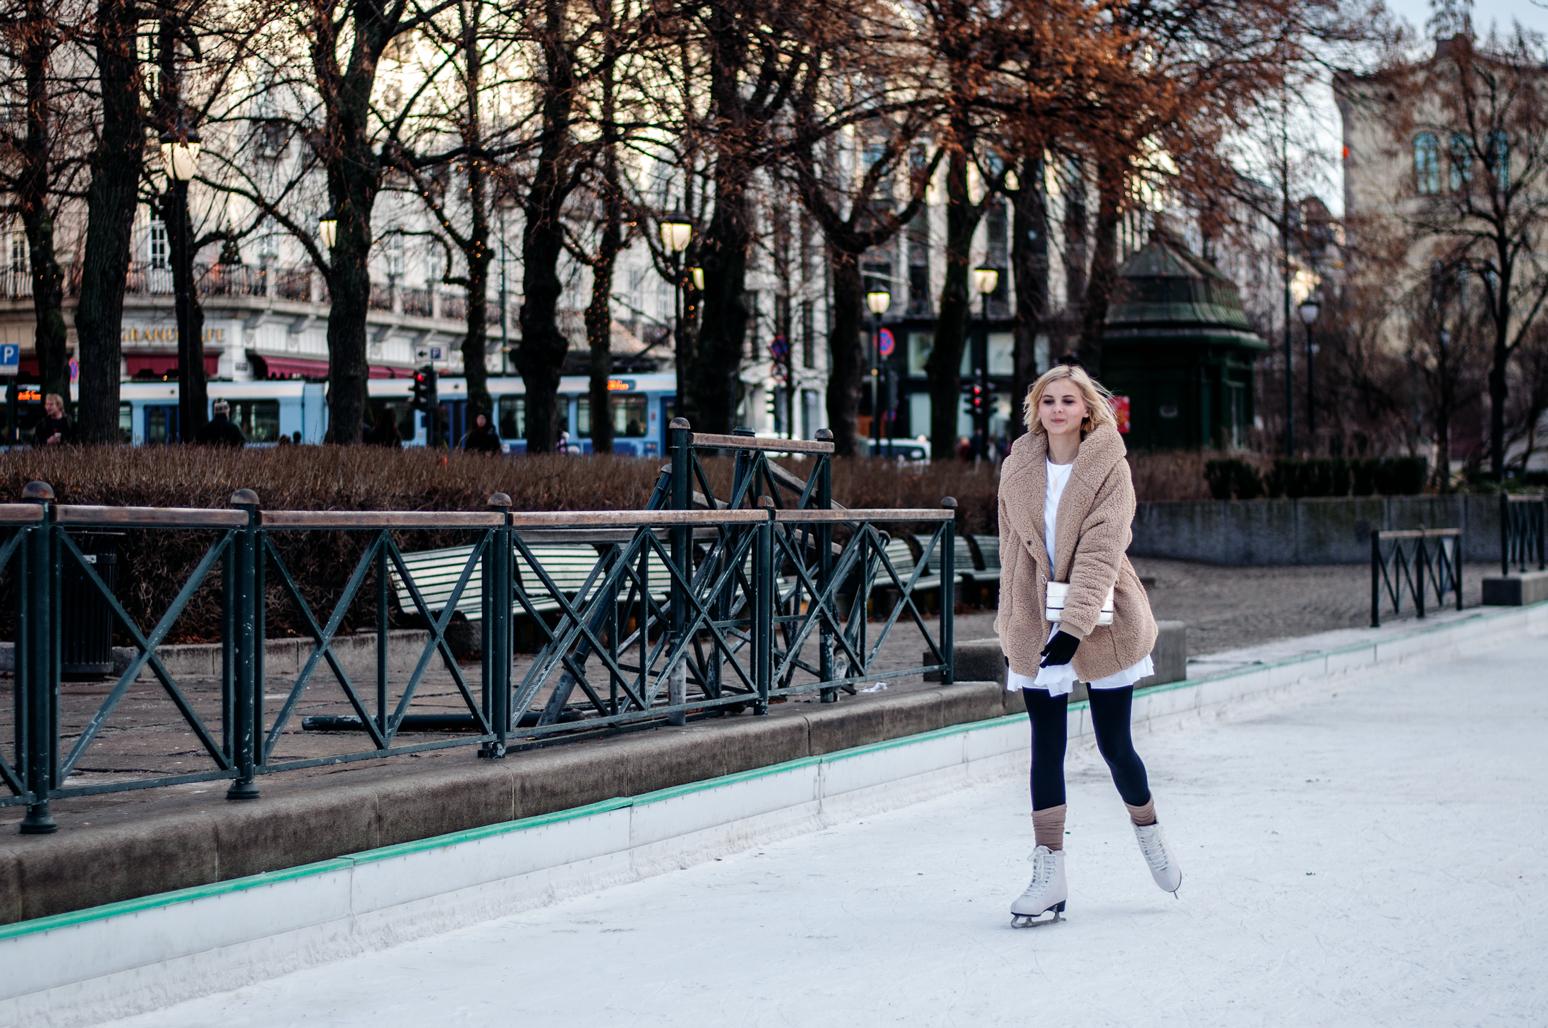 Eislaufen Oslo